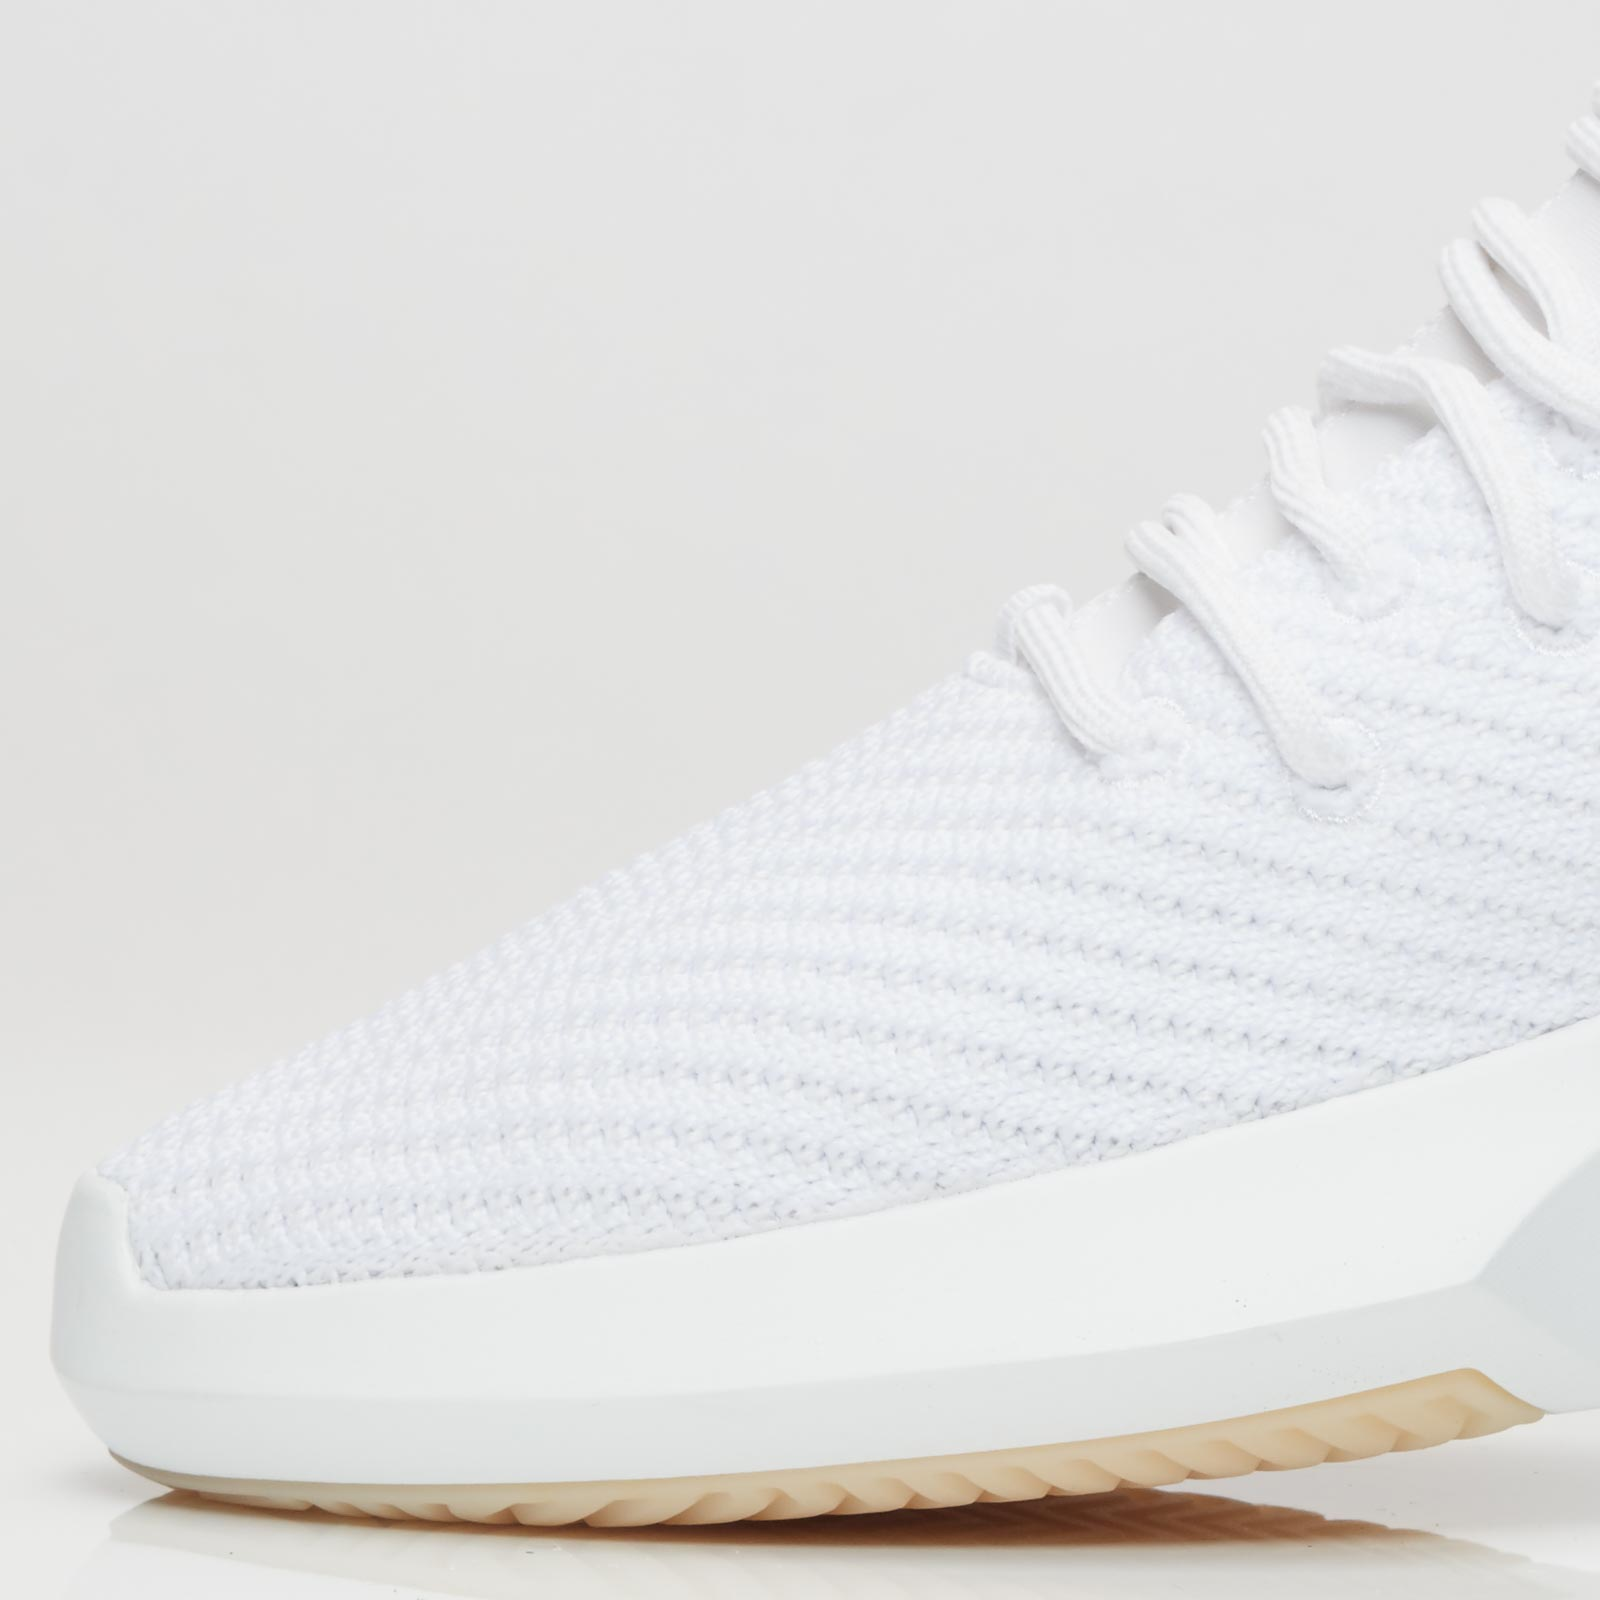 buy online c6ce4 1fd54 ... adidas Originals Crazy 1 Adv Primeknit